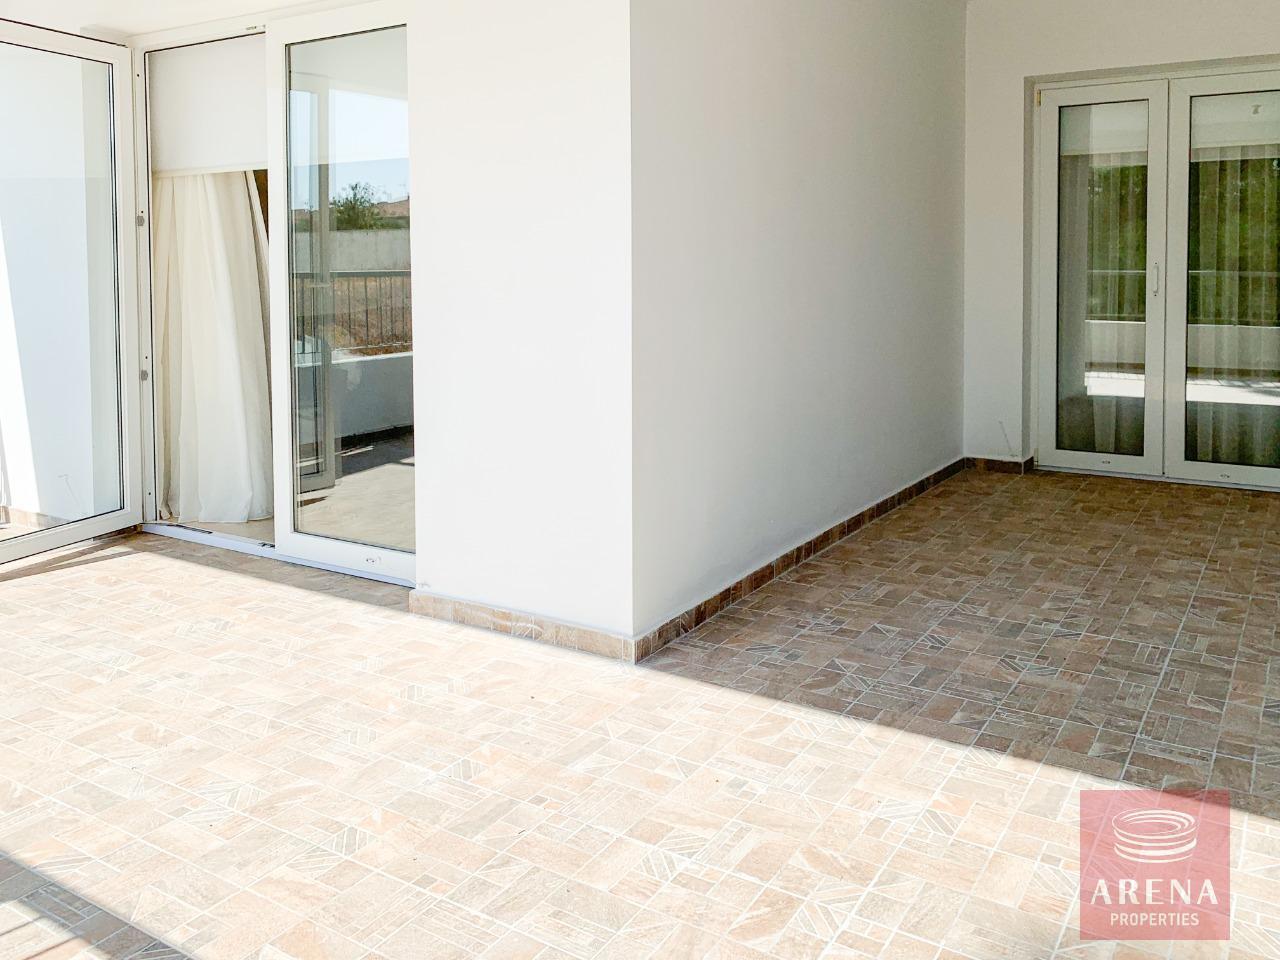 Apt for sale in Larnaca - balcony